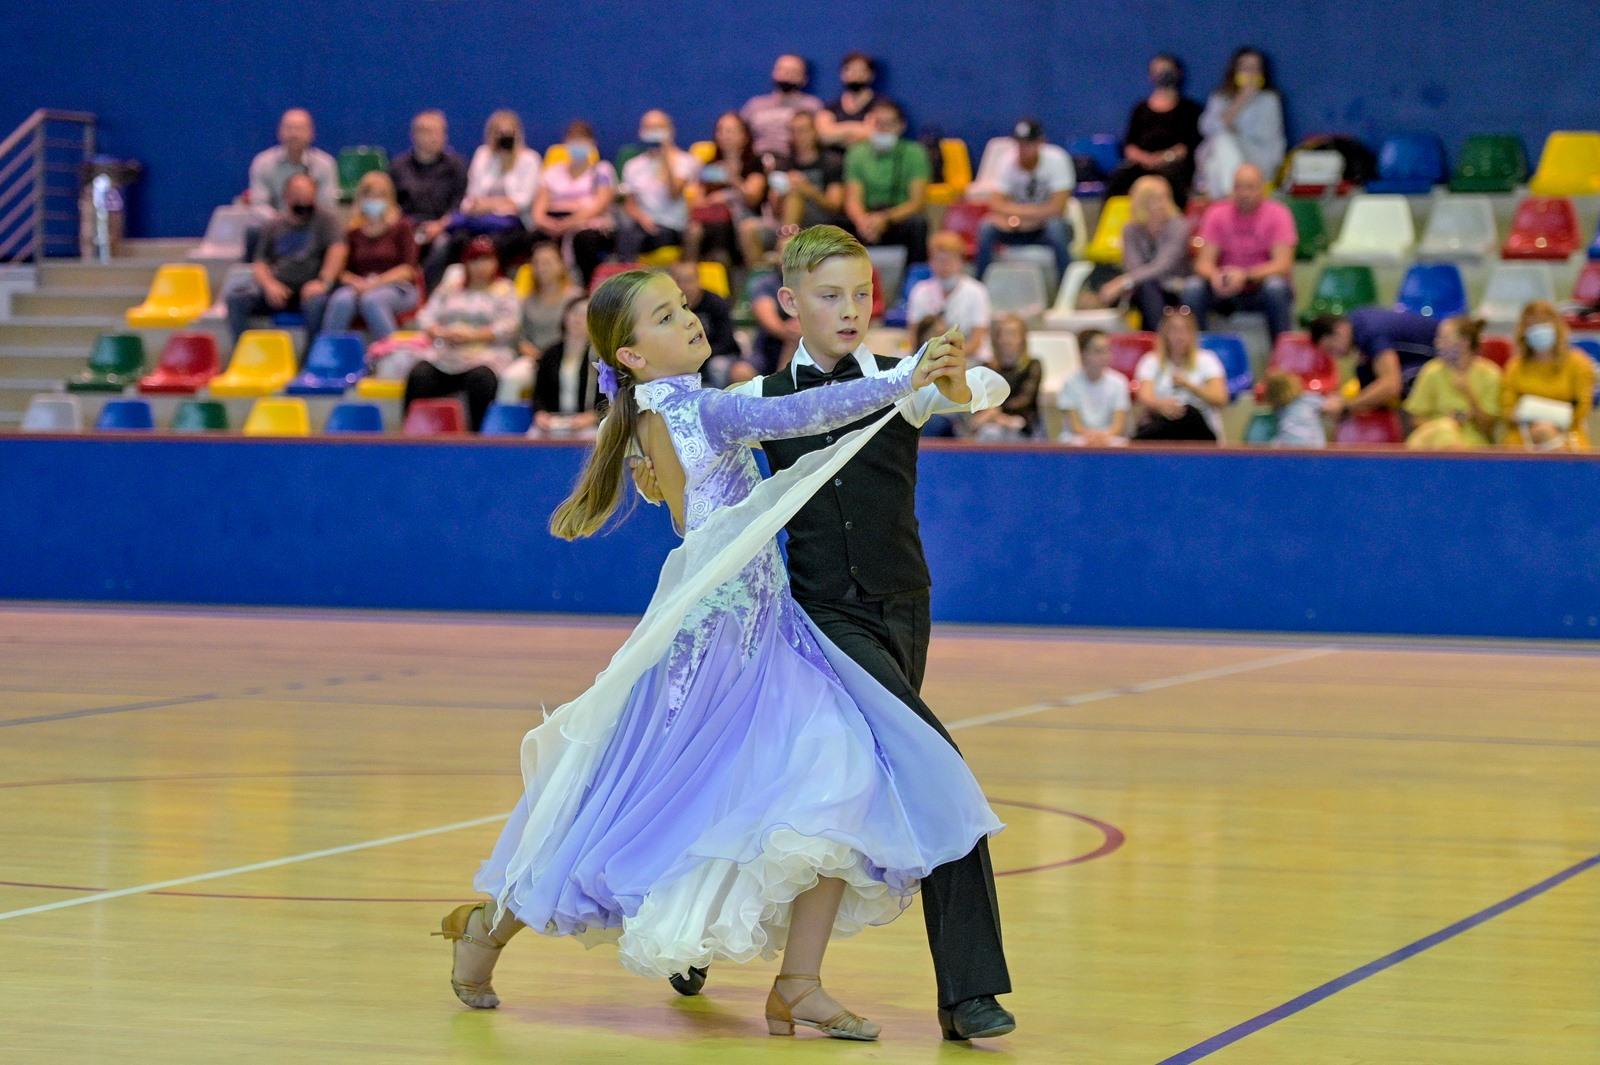 EU_tjedan_sporta_ples (11)